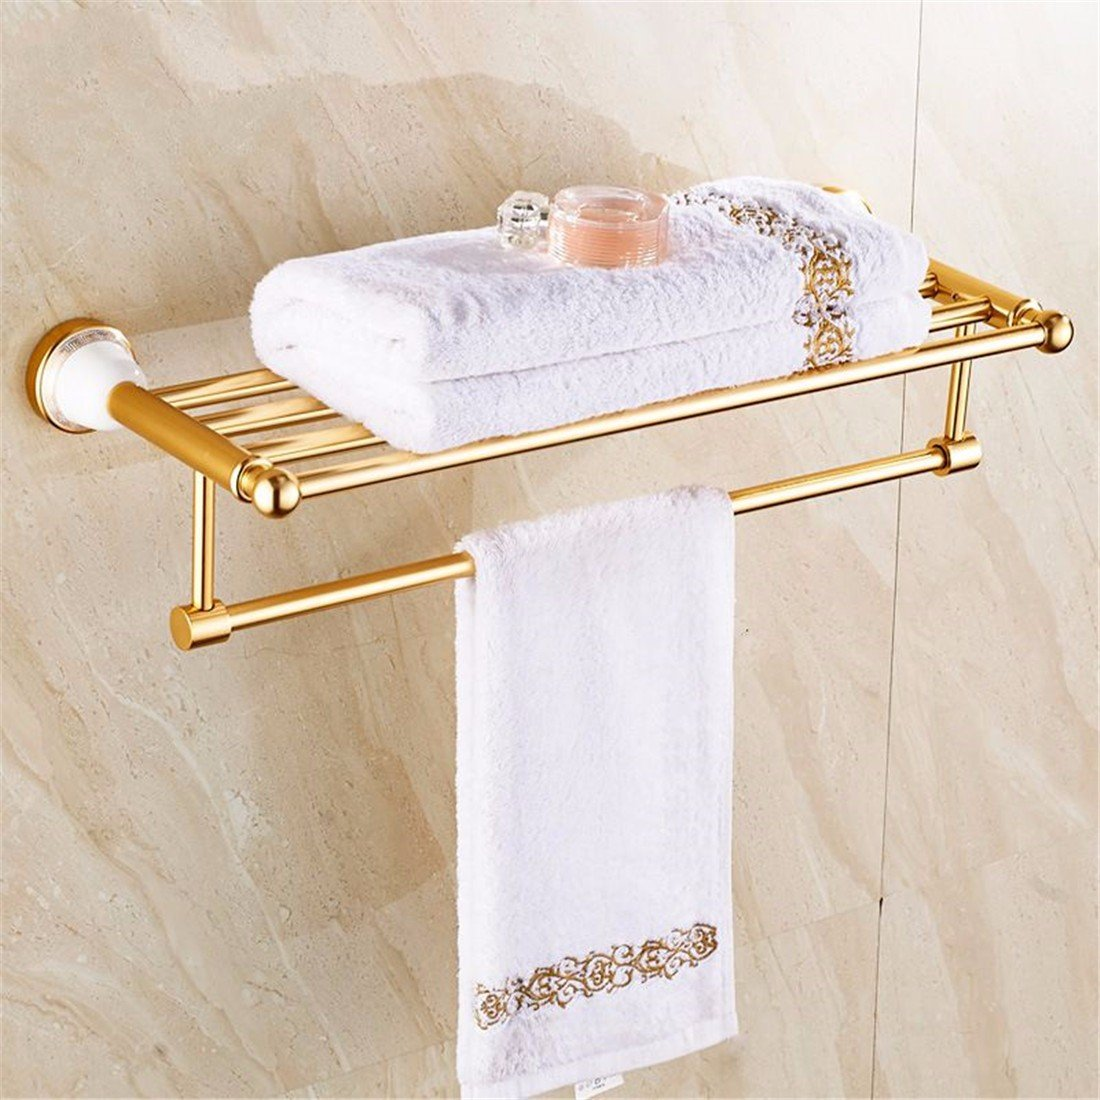 Laona Europeanアルミニウムゴールドアンティークセラミックベース、バスルーム継手、トイレ紙ラック、ソープディッシュ 9358462287523 B077D3PKCSTowel Rack